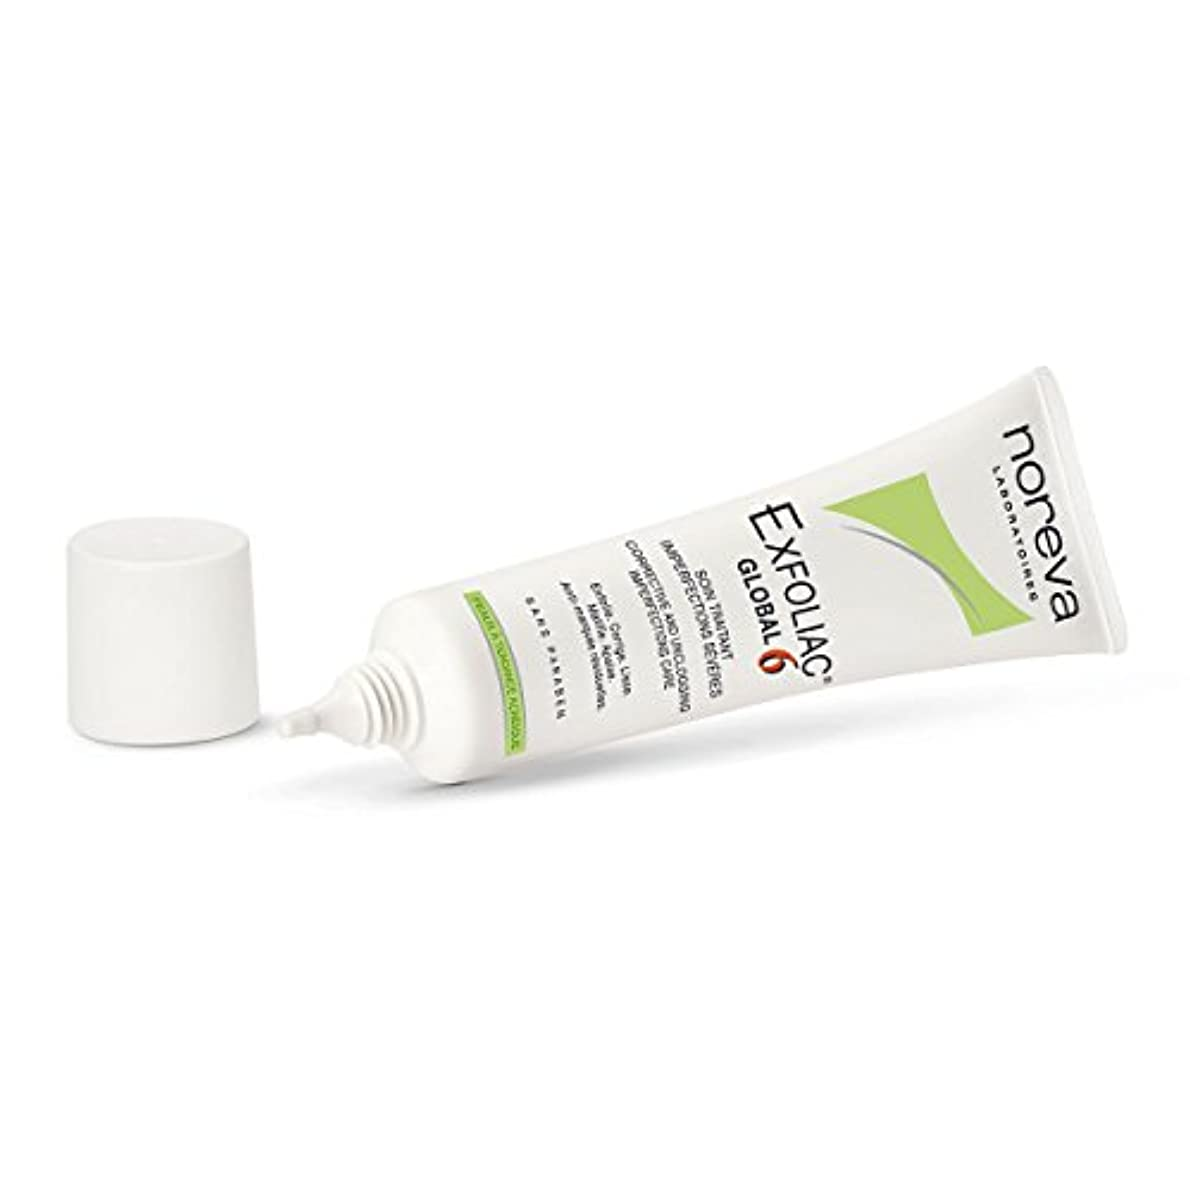 Noreva Exfoliac Global 6 30ml [並行輸入品]